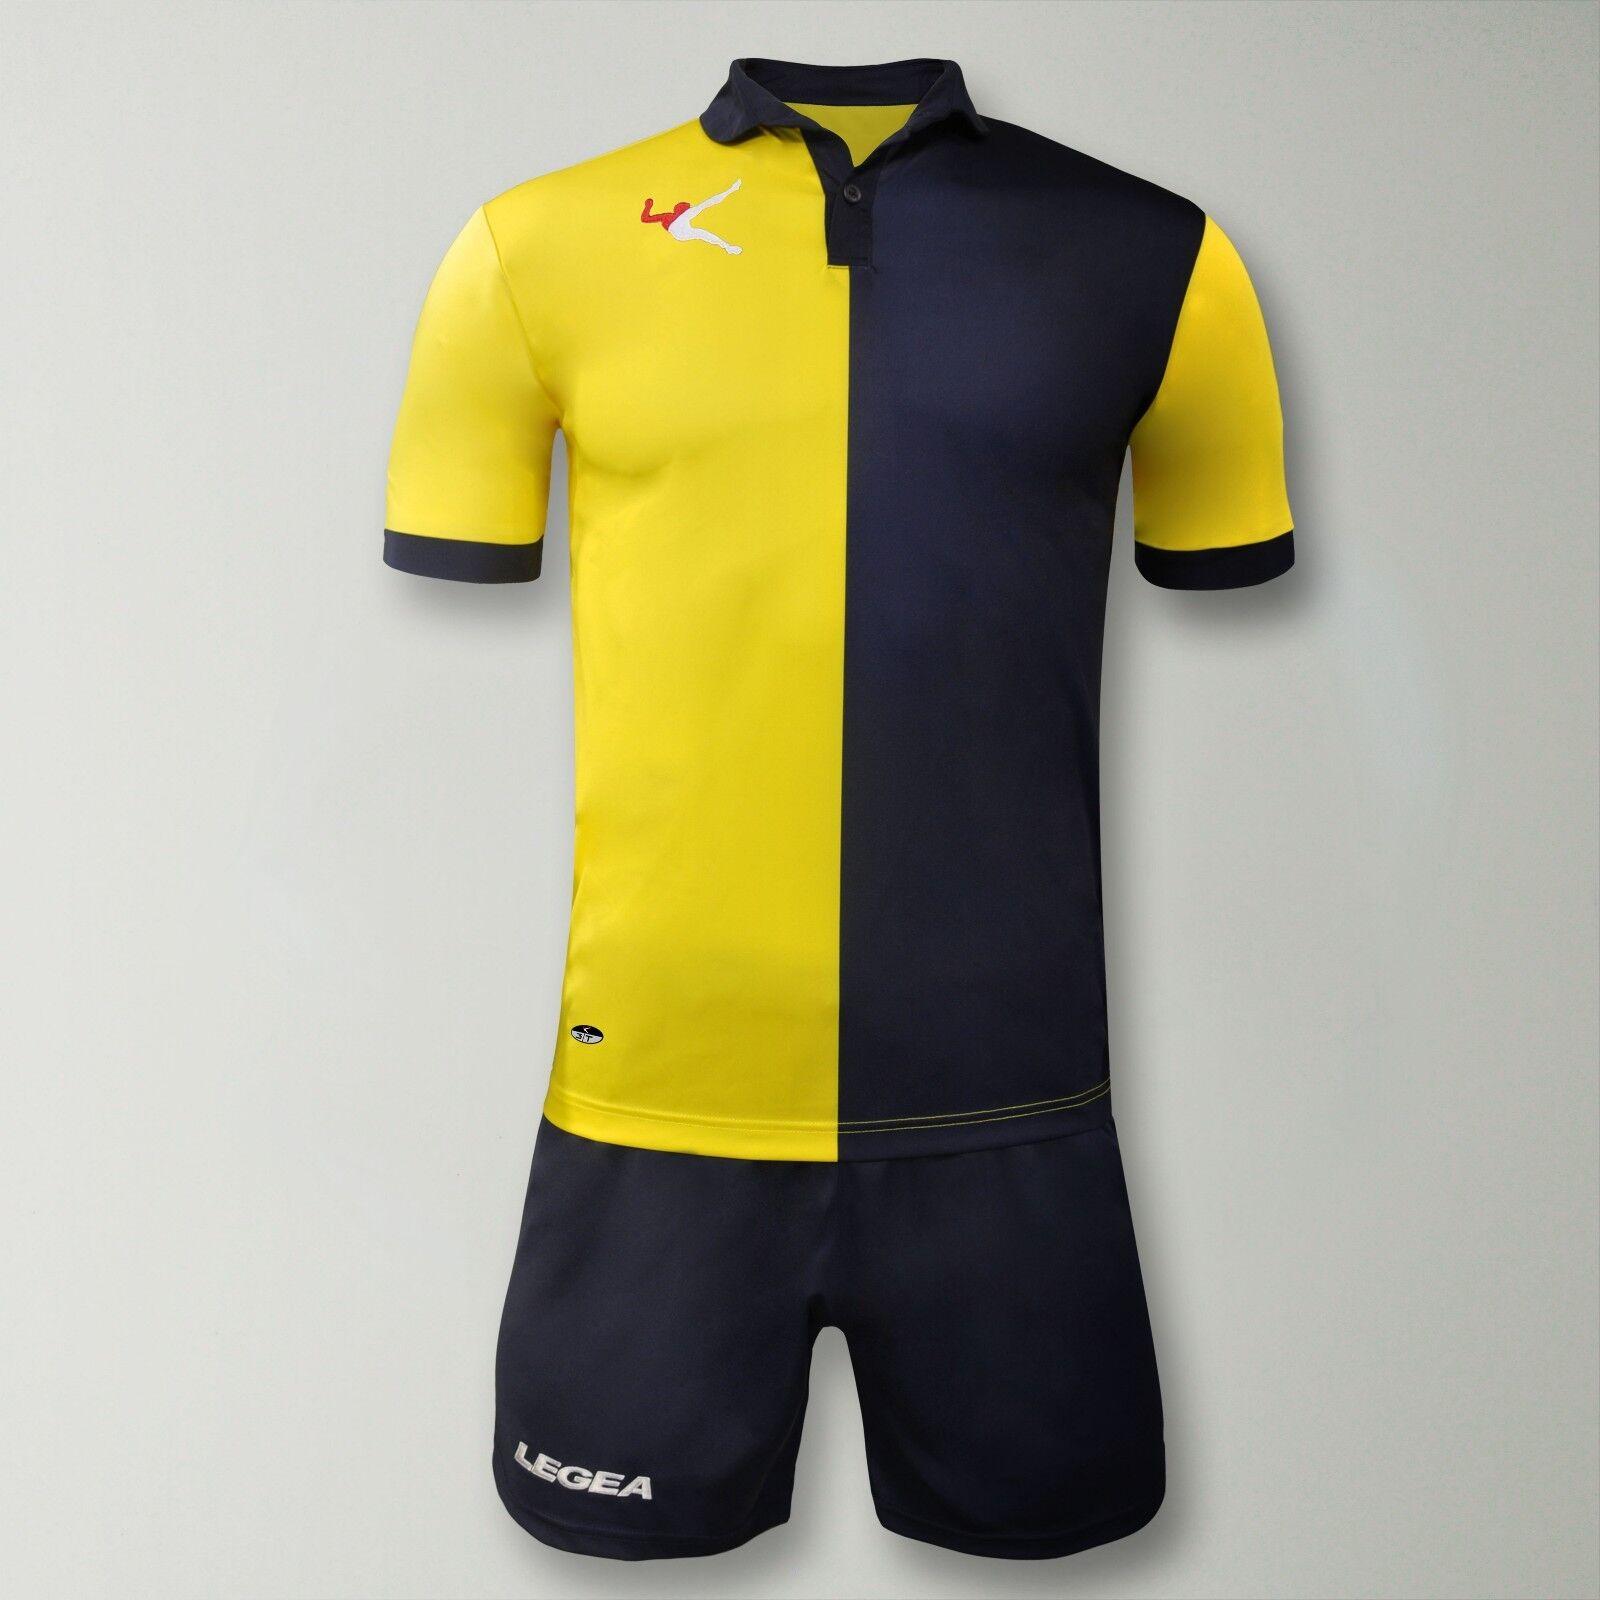 10er Trikotsatz Legea Sardegna Gold Fußball Trikot Trikot Trikot &Hose 3XS 2XS XS S M L XL  | Attraktive Mode  cd255e